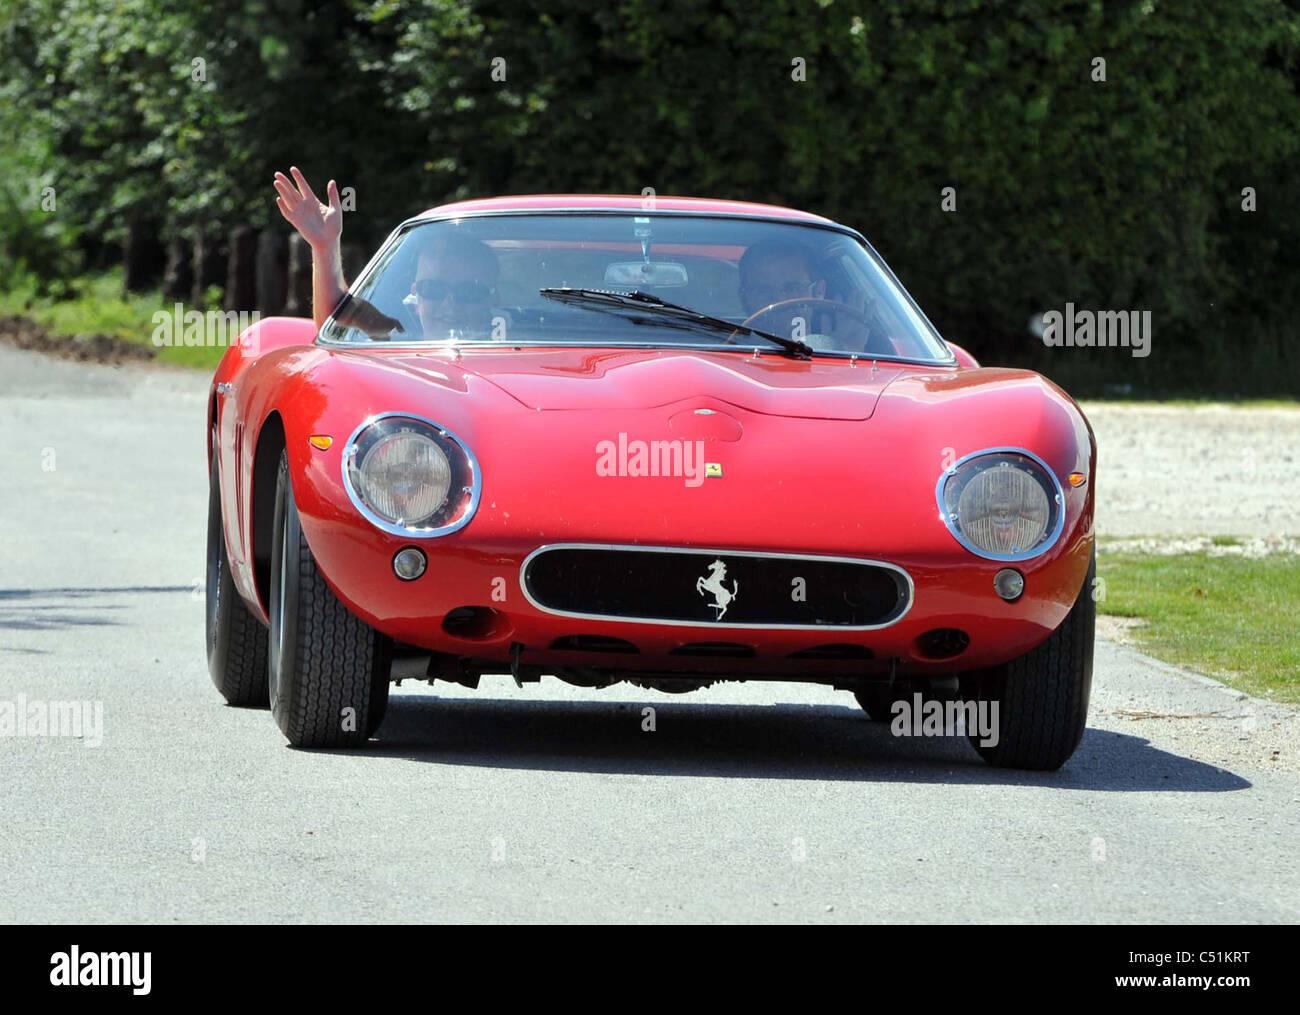 Uk Dorset Dj Chris Evans Drives His 12m Red 1963 Ferrari 250 Gto Stock Photo Alamy